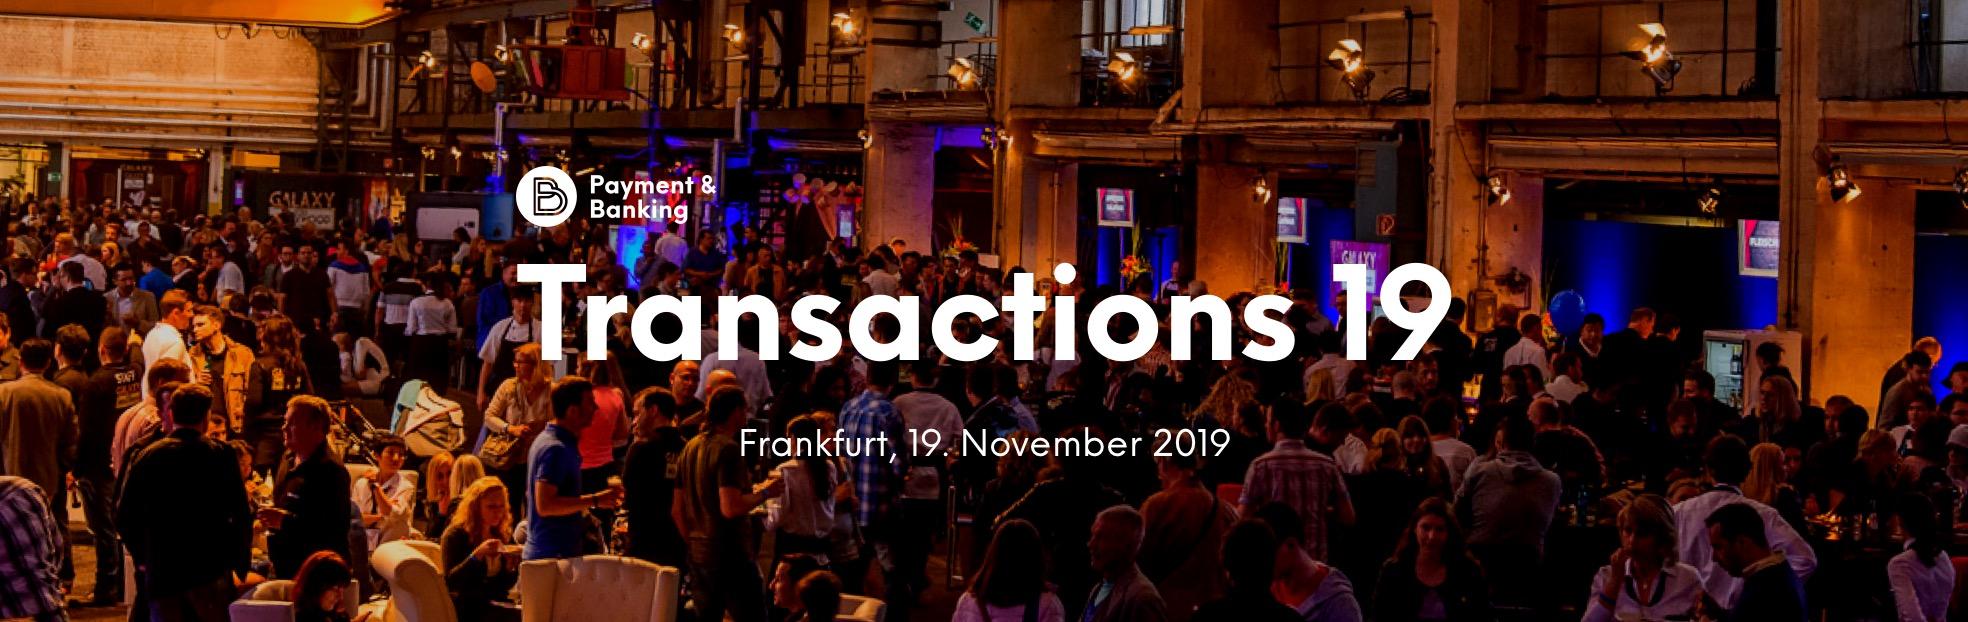 Transactions 19_Banner